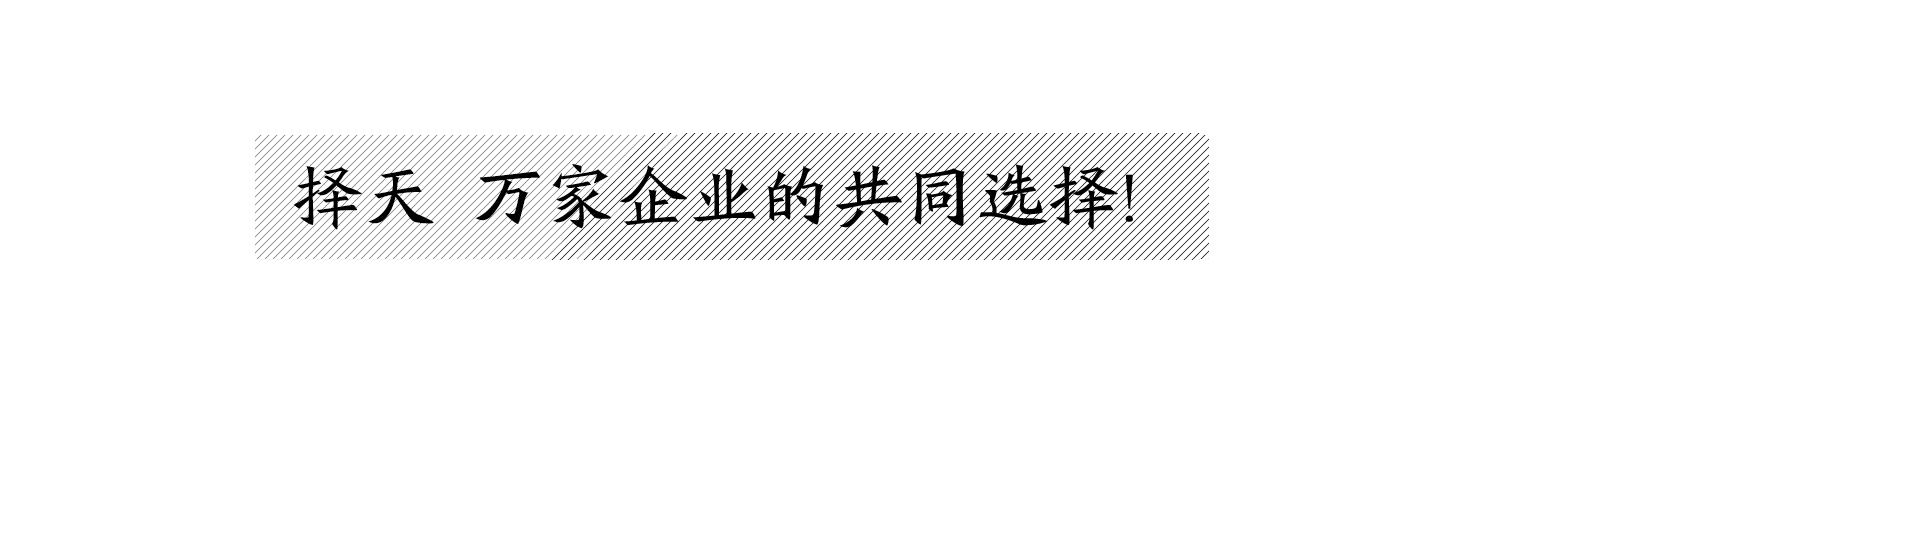 天津必威体育betway代理